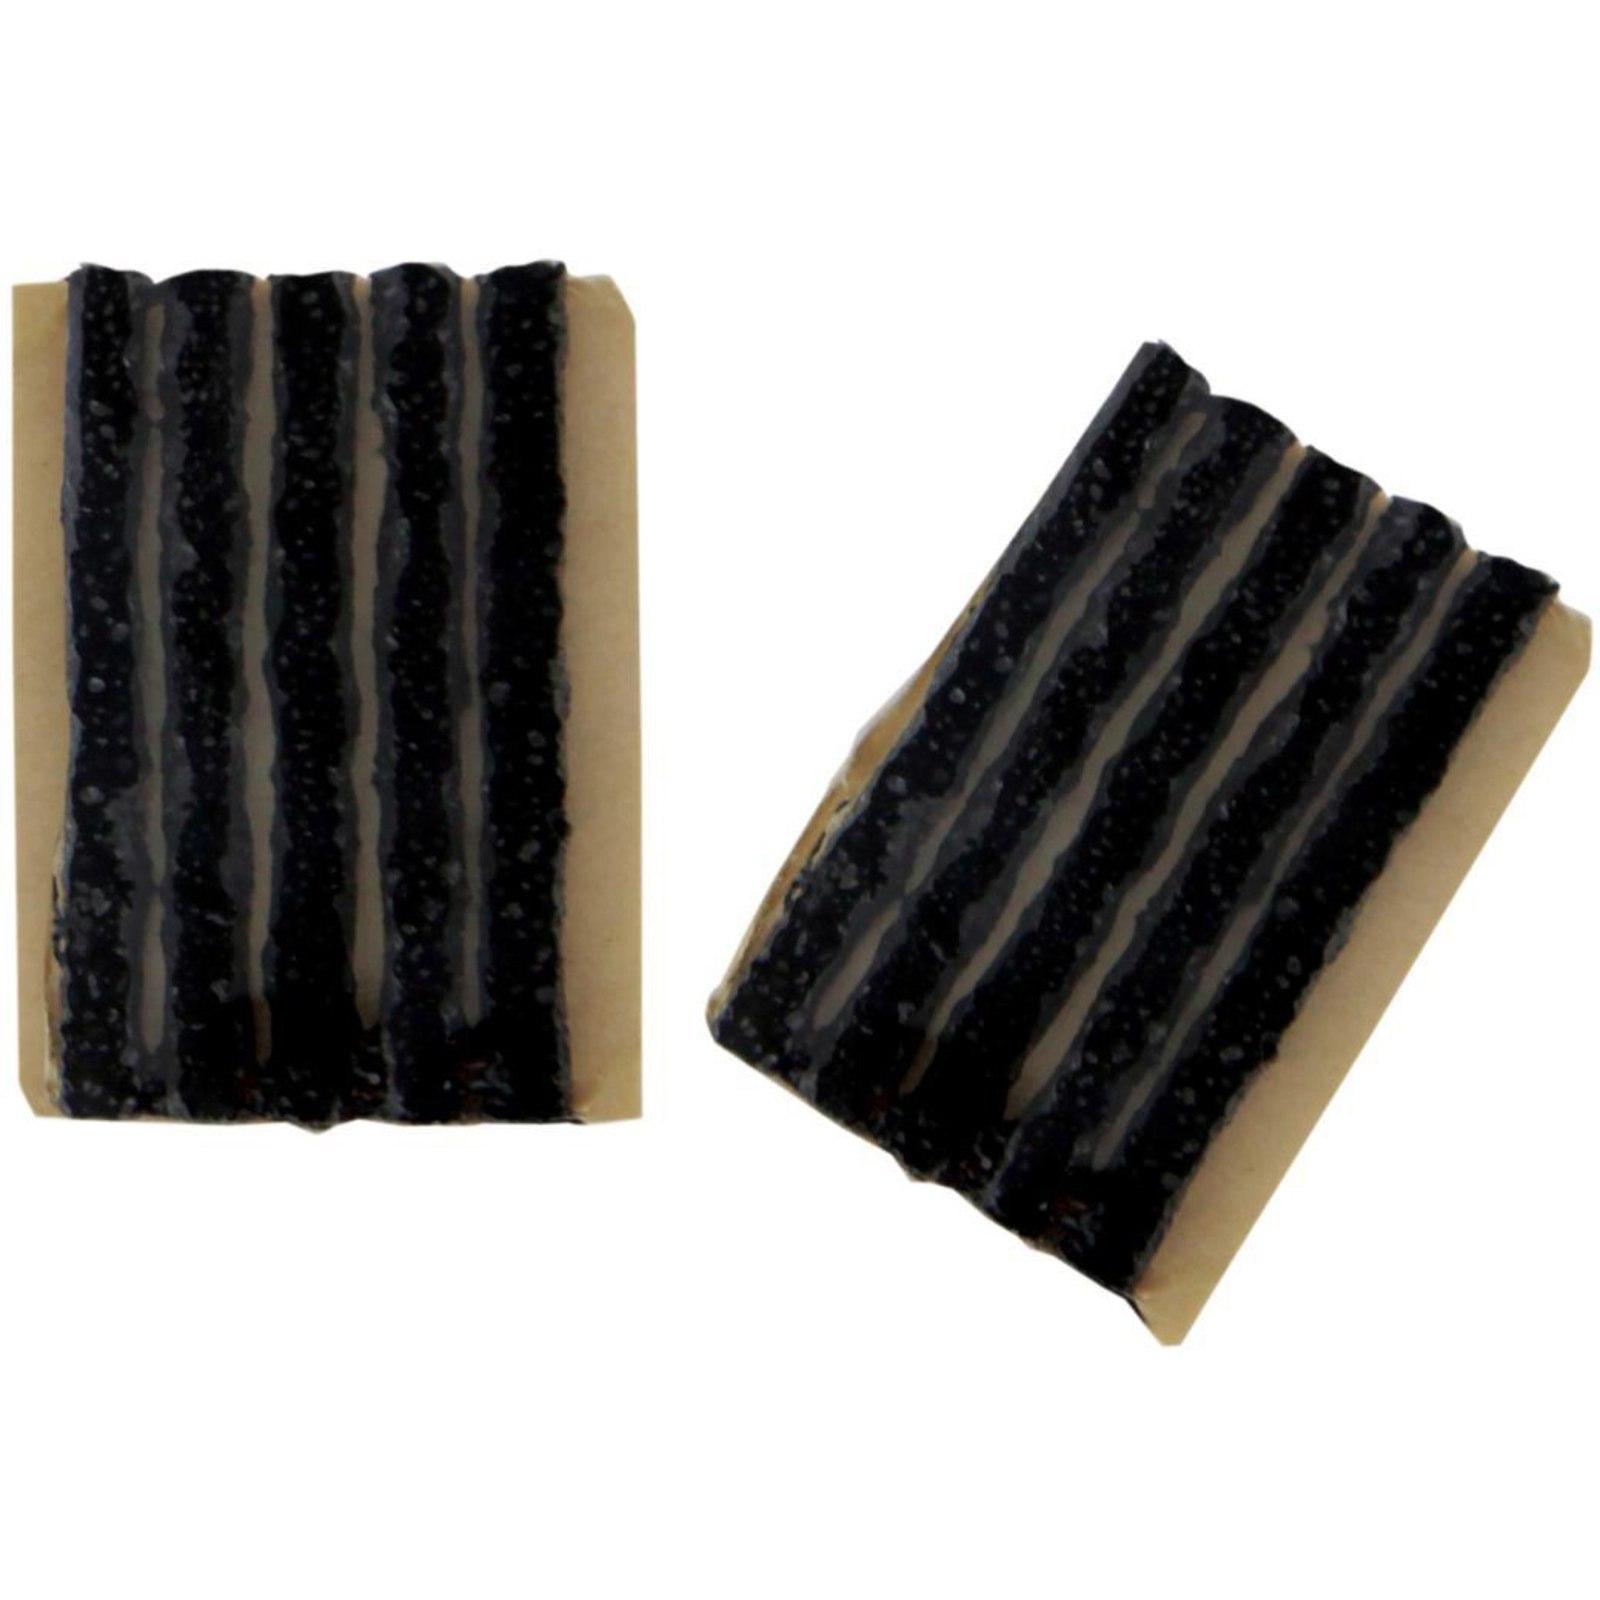 Image of Lezyne Tubeless Plug Refill Pack - 10 plugs